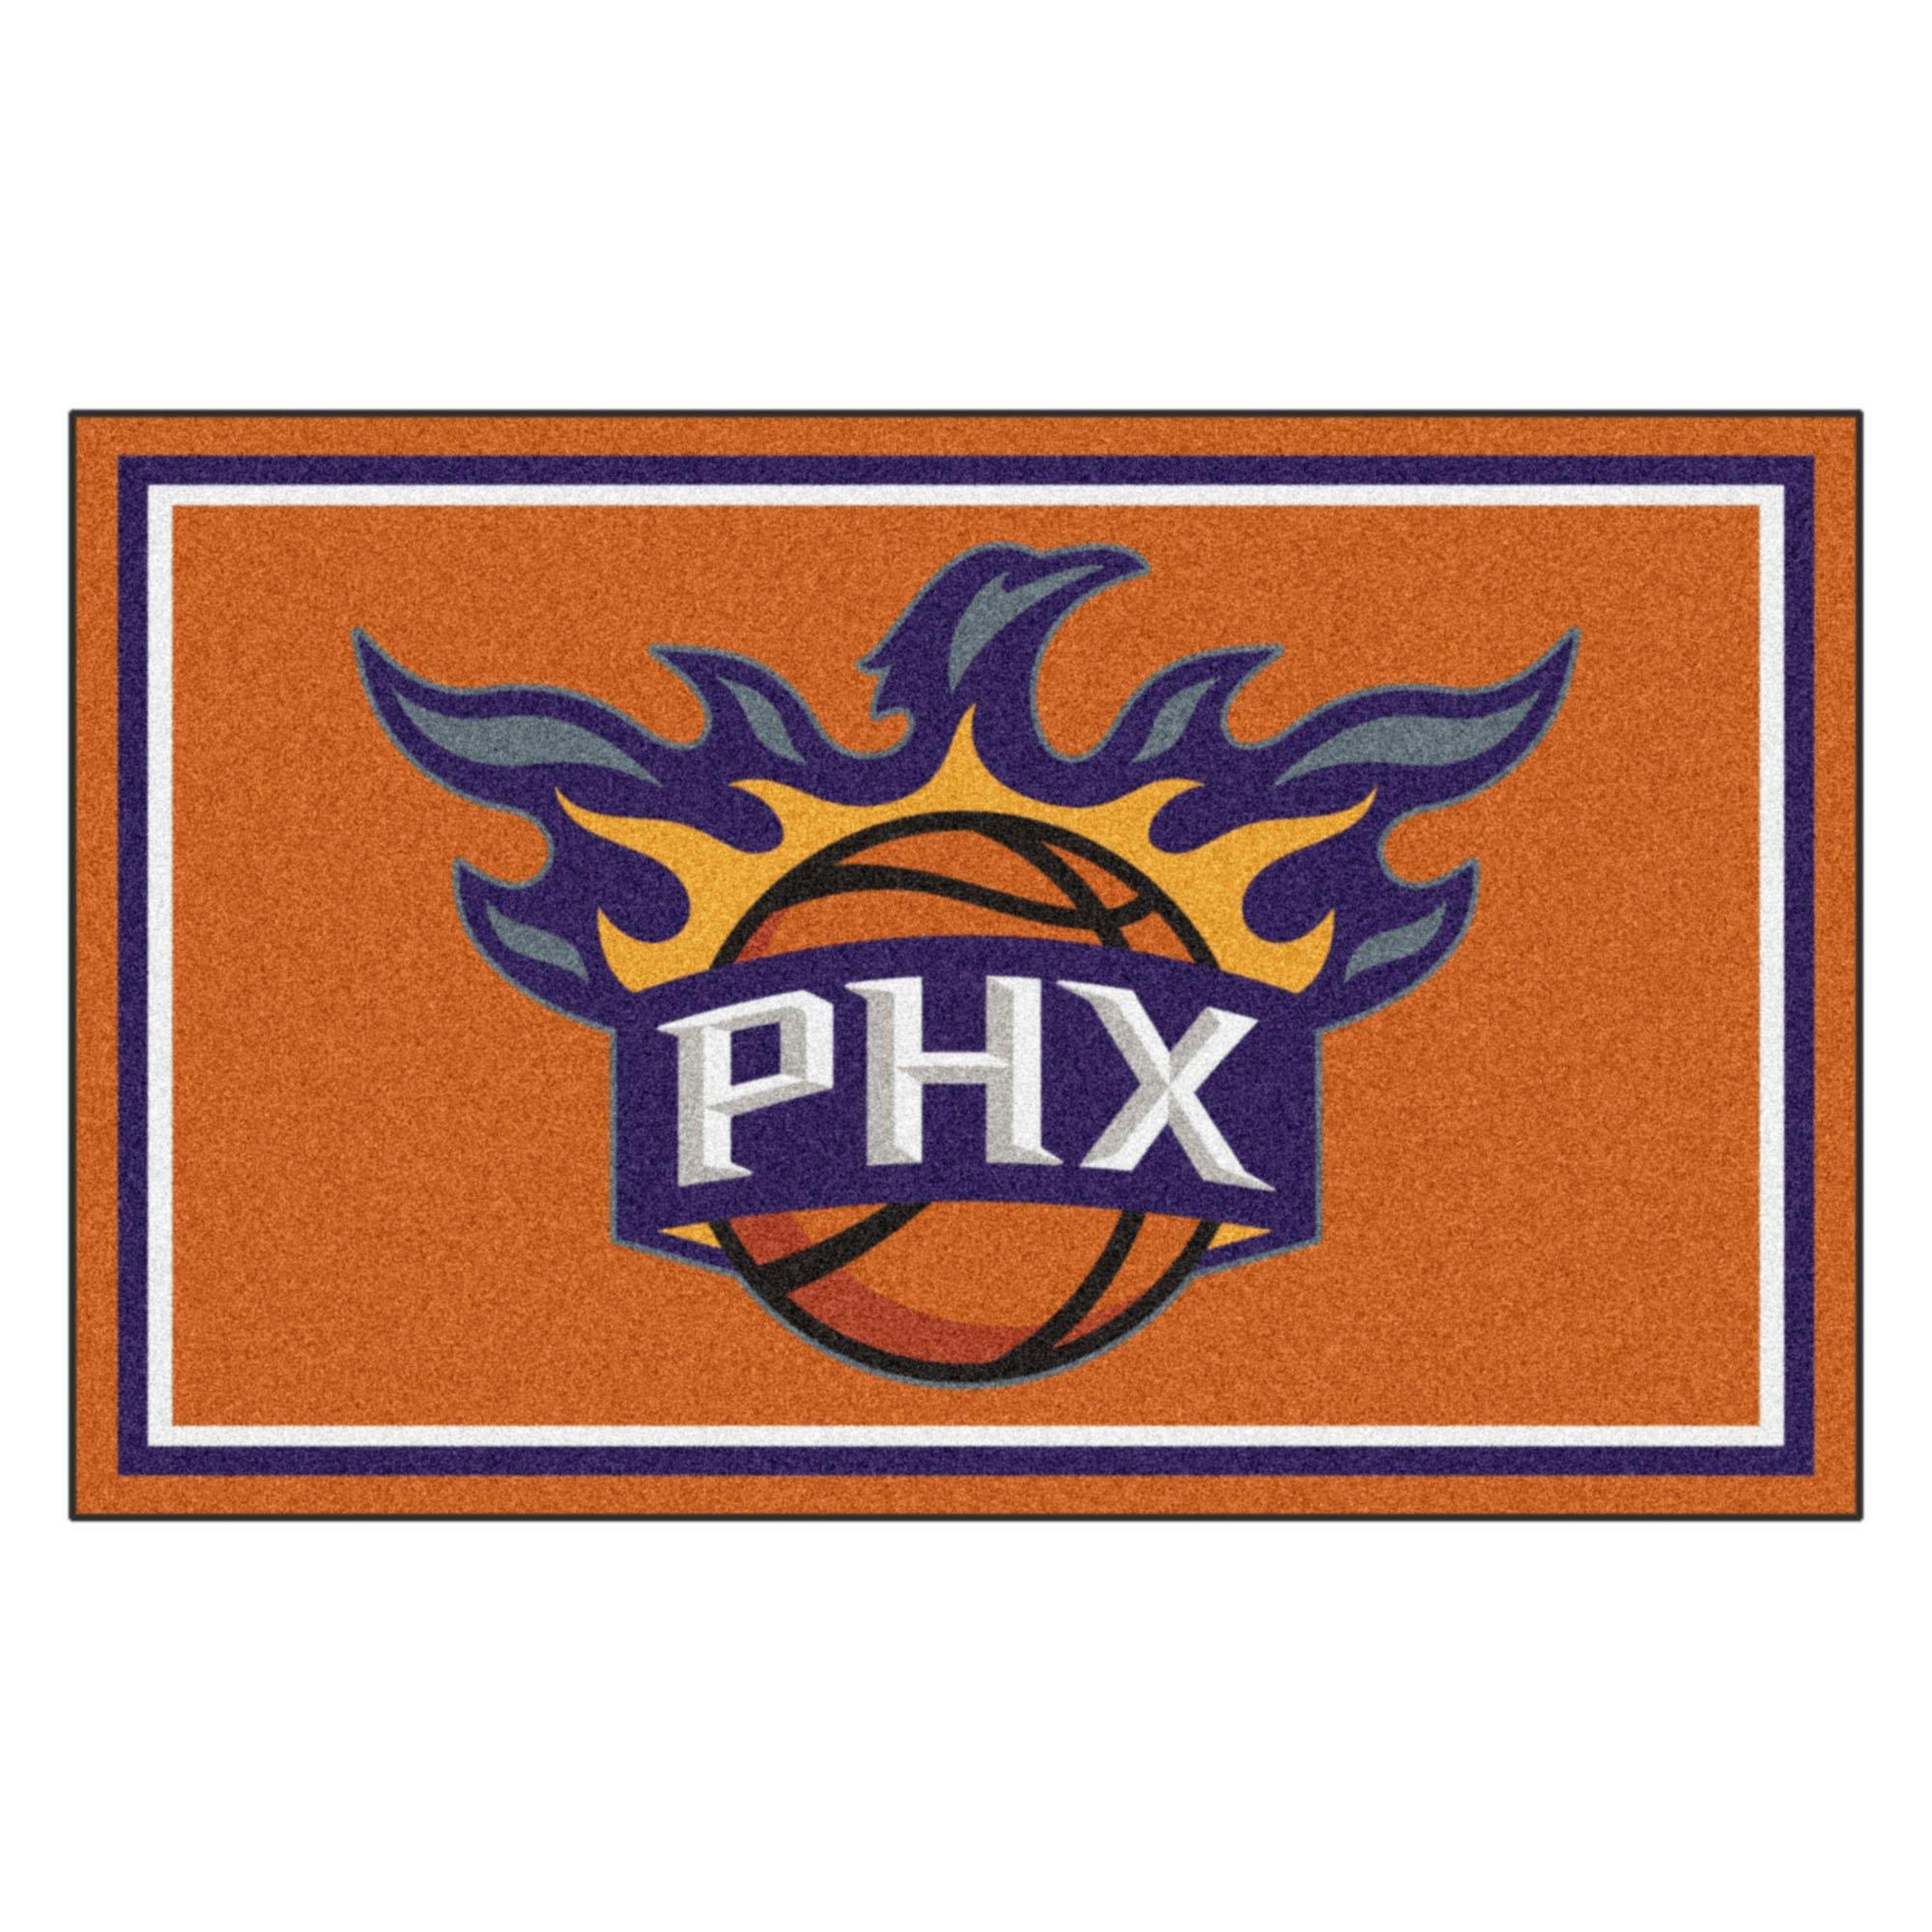 FANMATS 20441 44''x71'' Team Color NBA - Phoenix Suns Rug